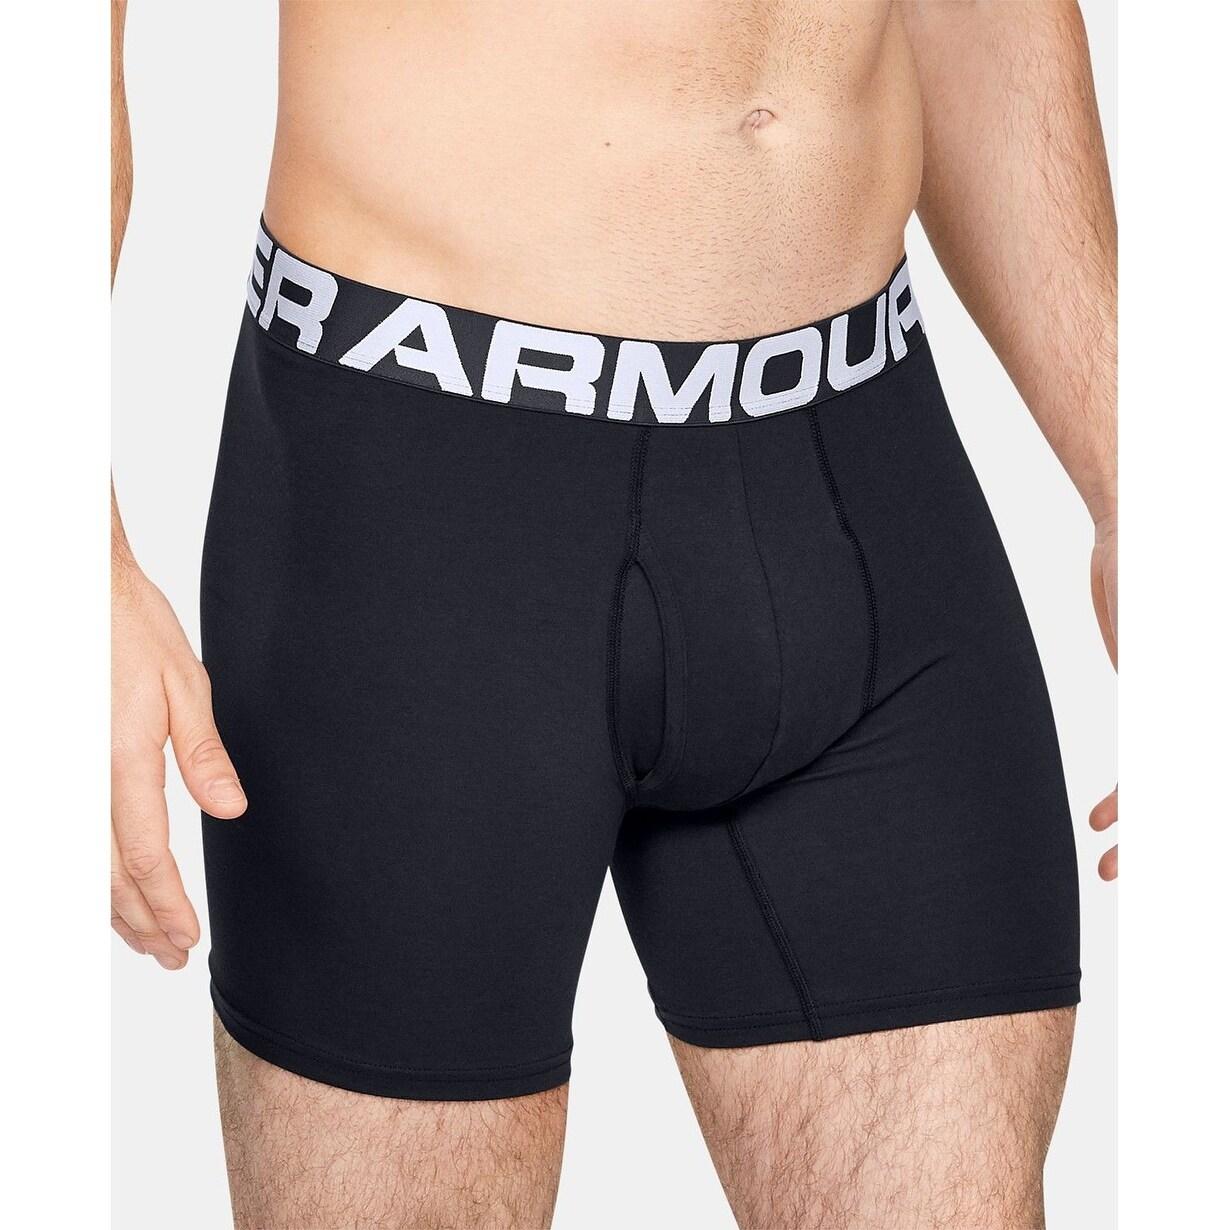 Under Armour Mens Boxerjock Black Underwear 3 Pk Black Size Extra Large - X-Large